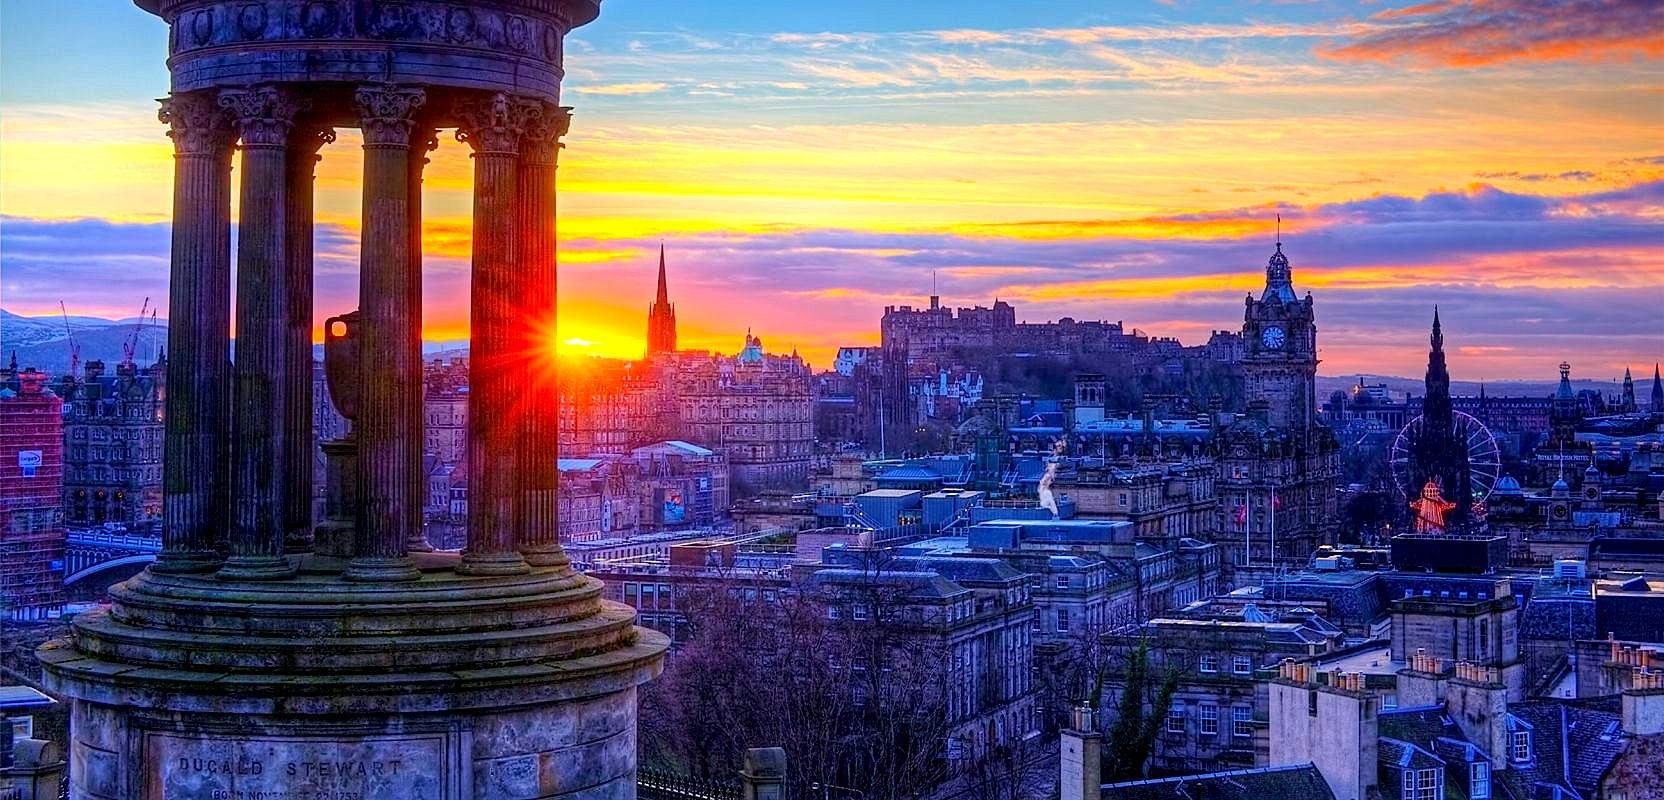 Qyteti i Edinburghut